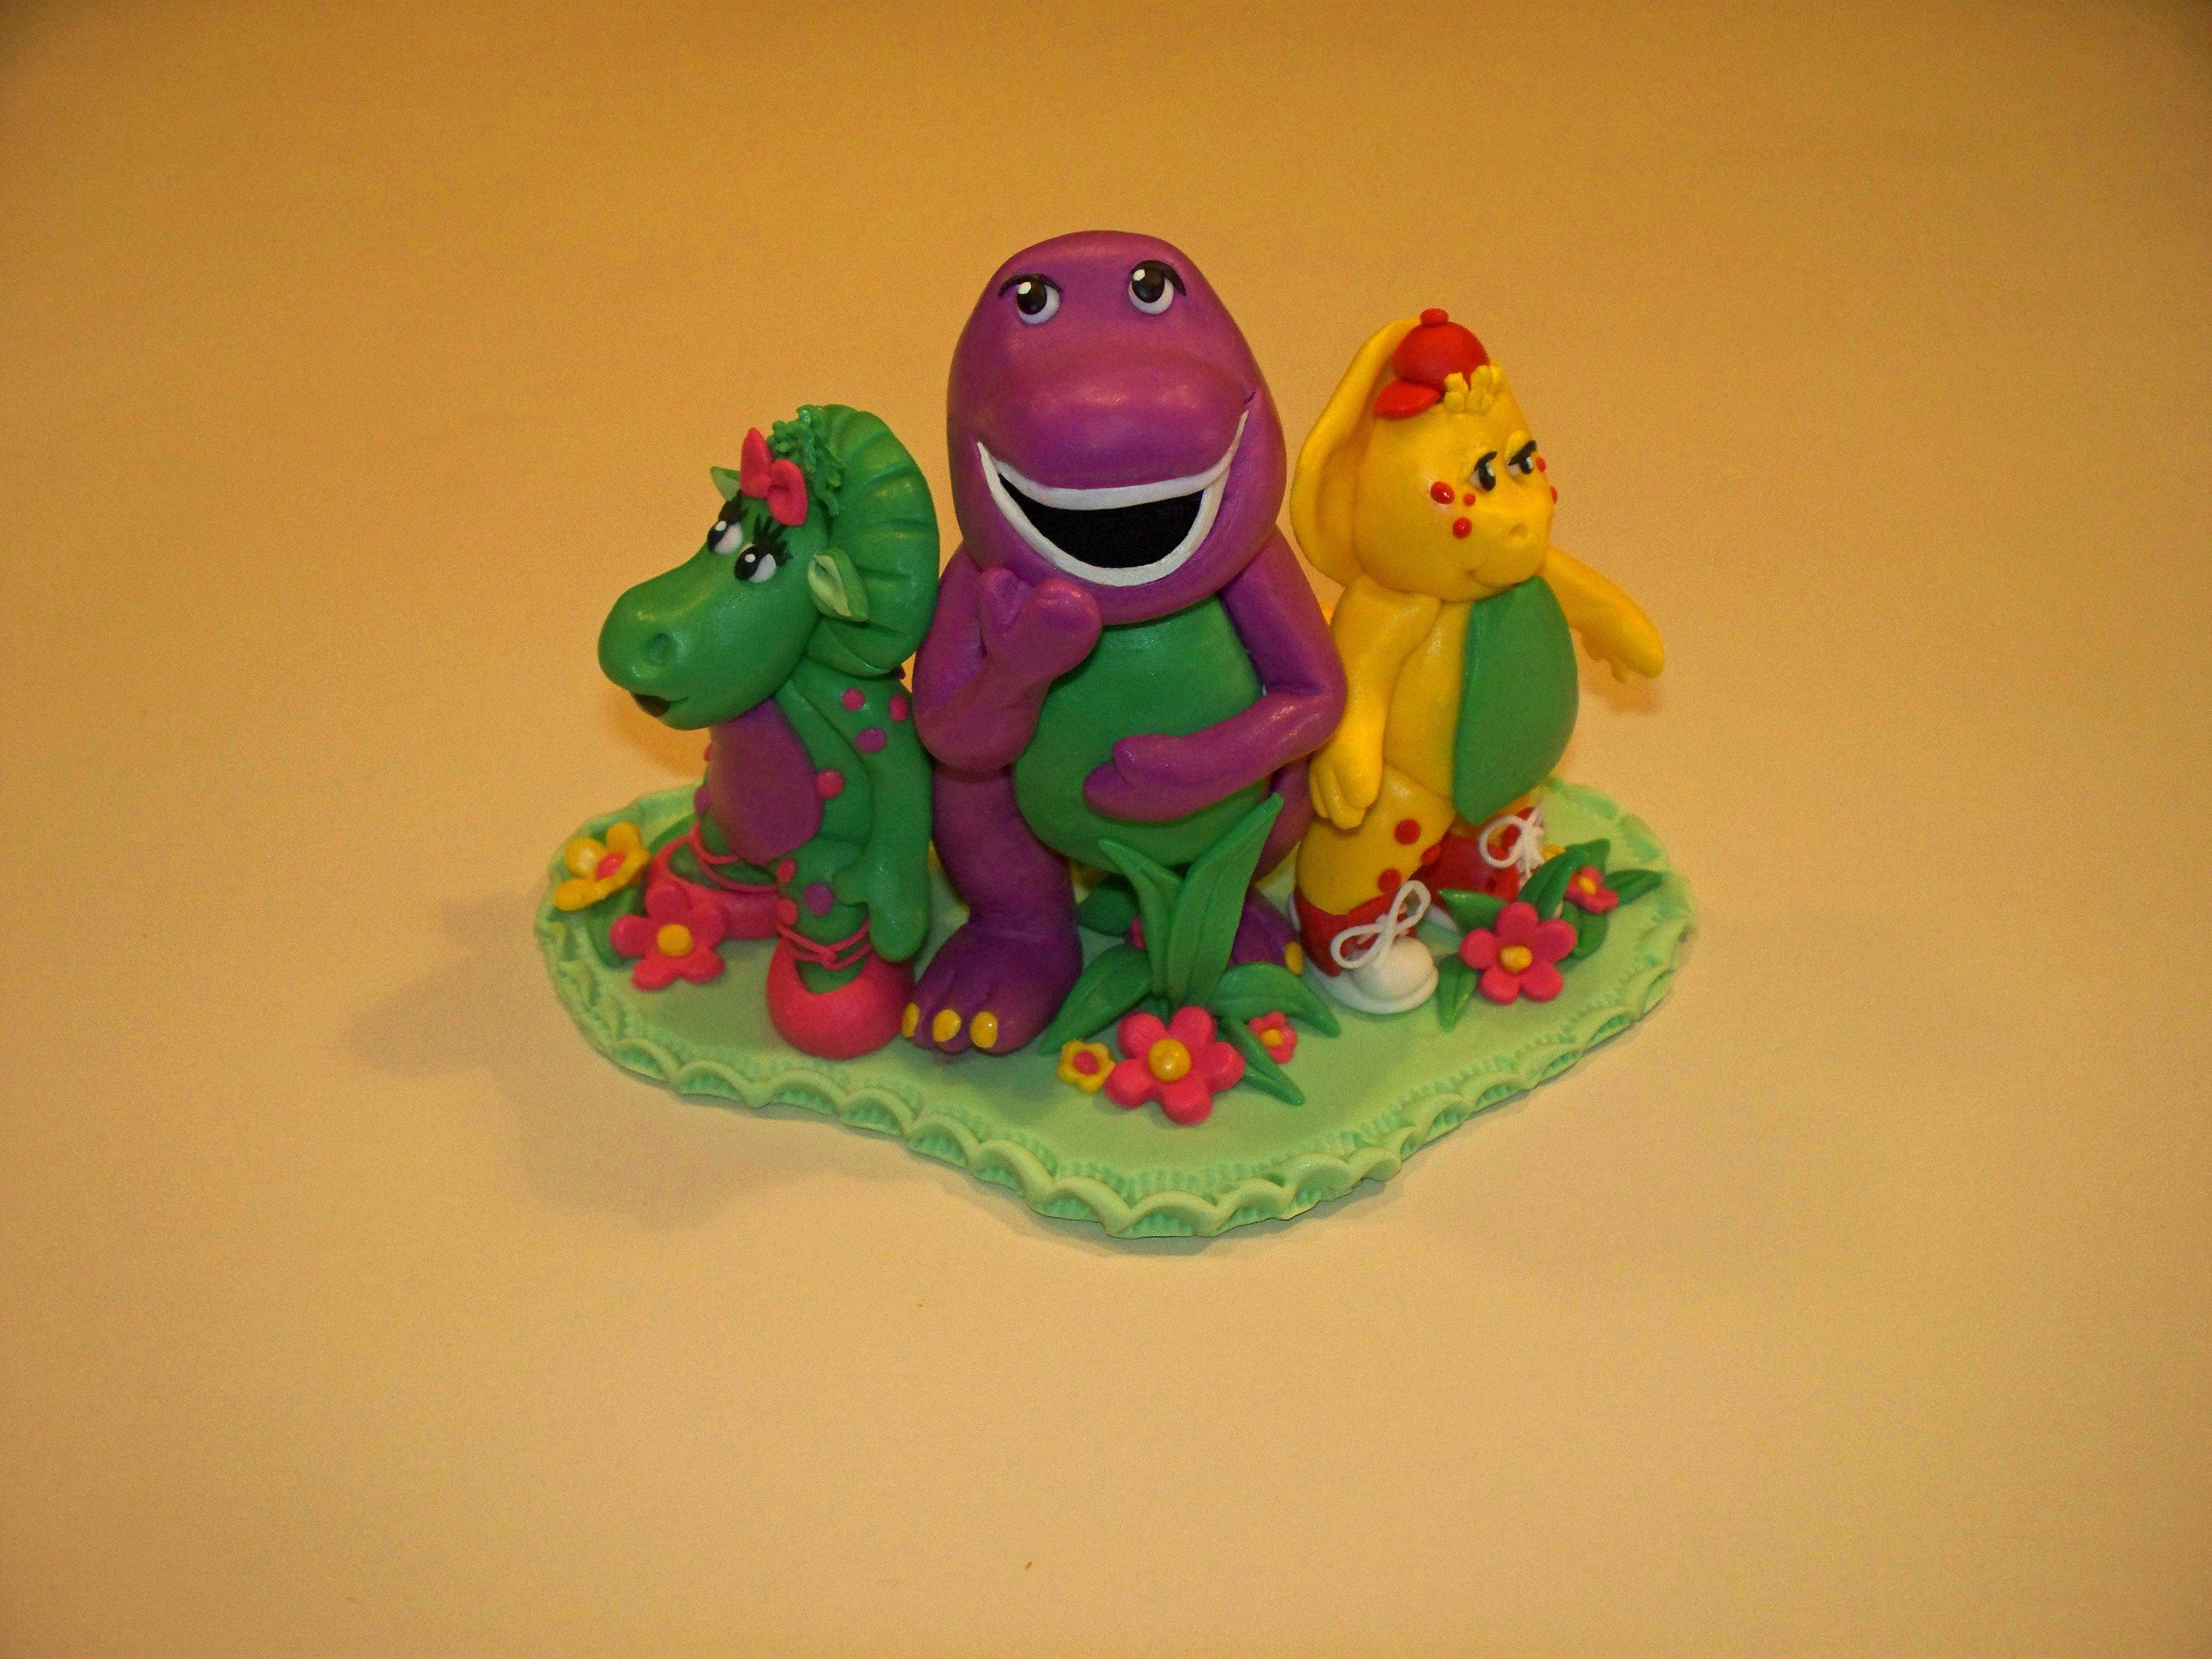 Fondant Barney Amp Friends Cake Topper Fondant With Tylose